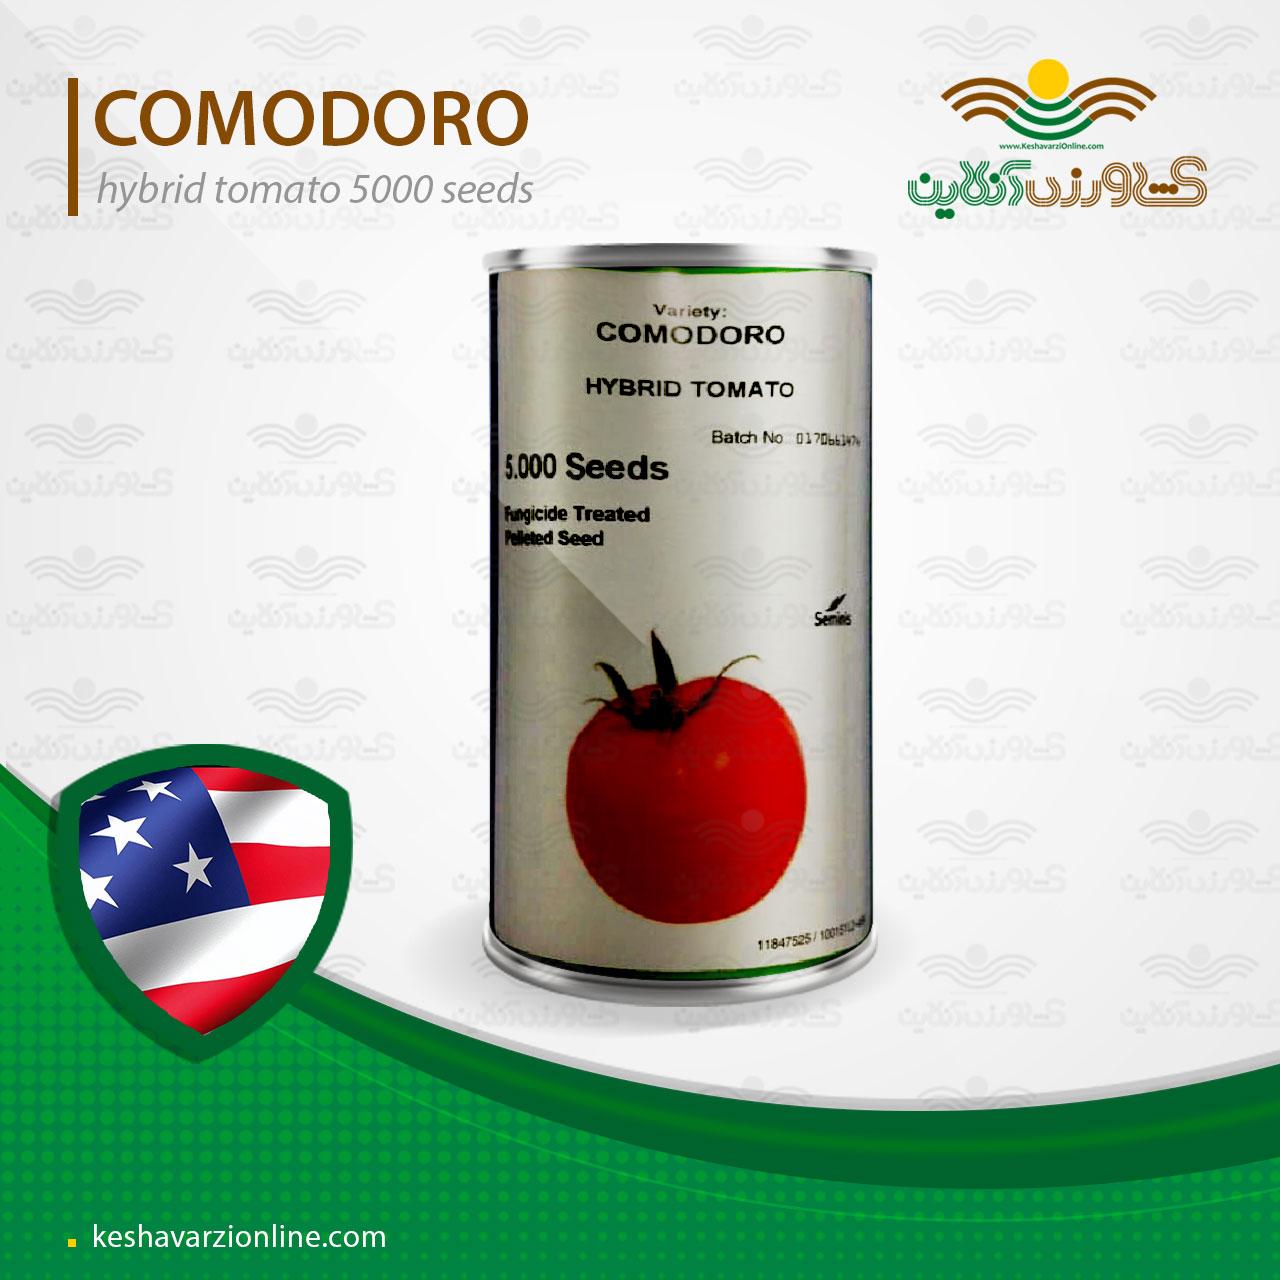 بذر گوجه فرنگی کومودور